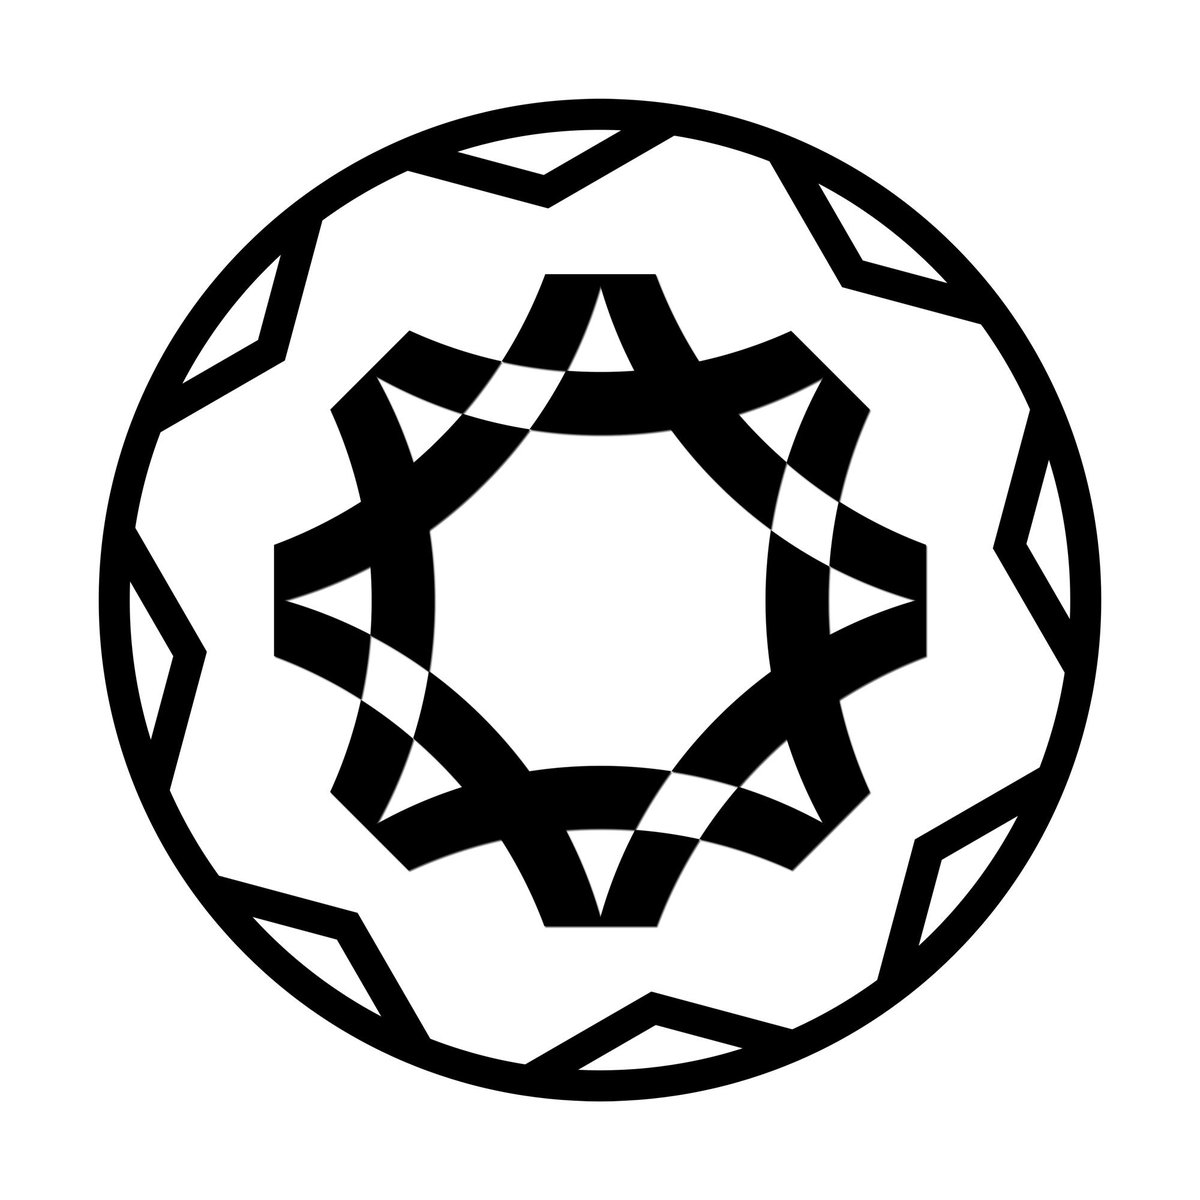 #logo #logos #logodesigns #design #designlogo  #newpost #branding #brandingdesign #business #portraitstudio #atv64nguyentuan #hanoi🇻🇳 #vietnam🇻🇳 #Tweet #photooftheday #photography #shape #designer #geometric  #lego #style #shapeofyou #blackandwhite #graphicdesign #decor #graphics https://t.co/ZX8HkabmEo